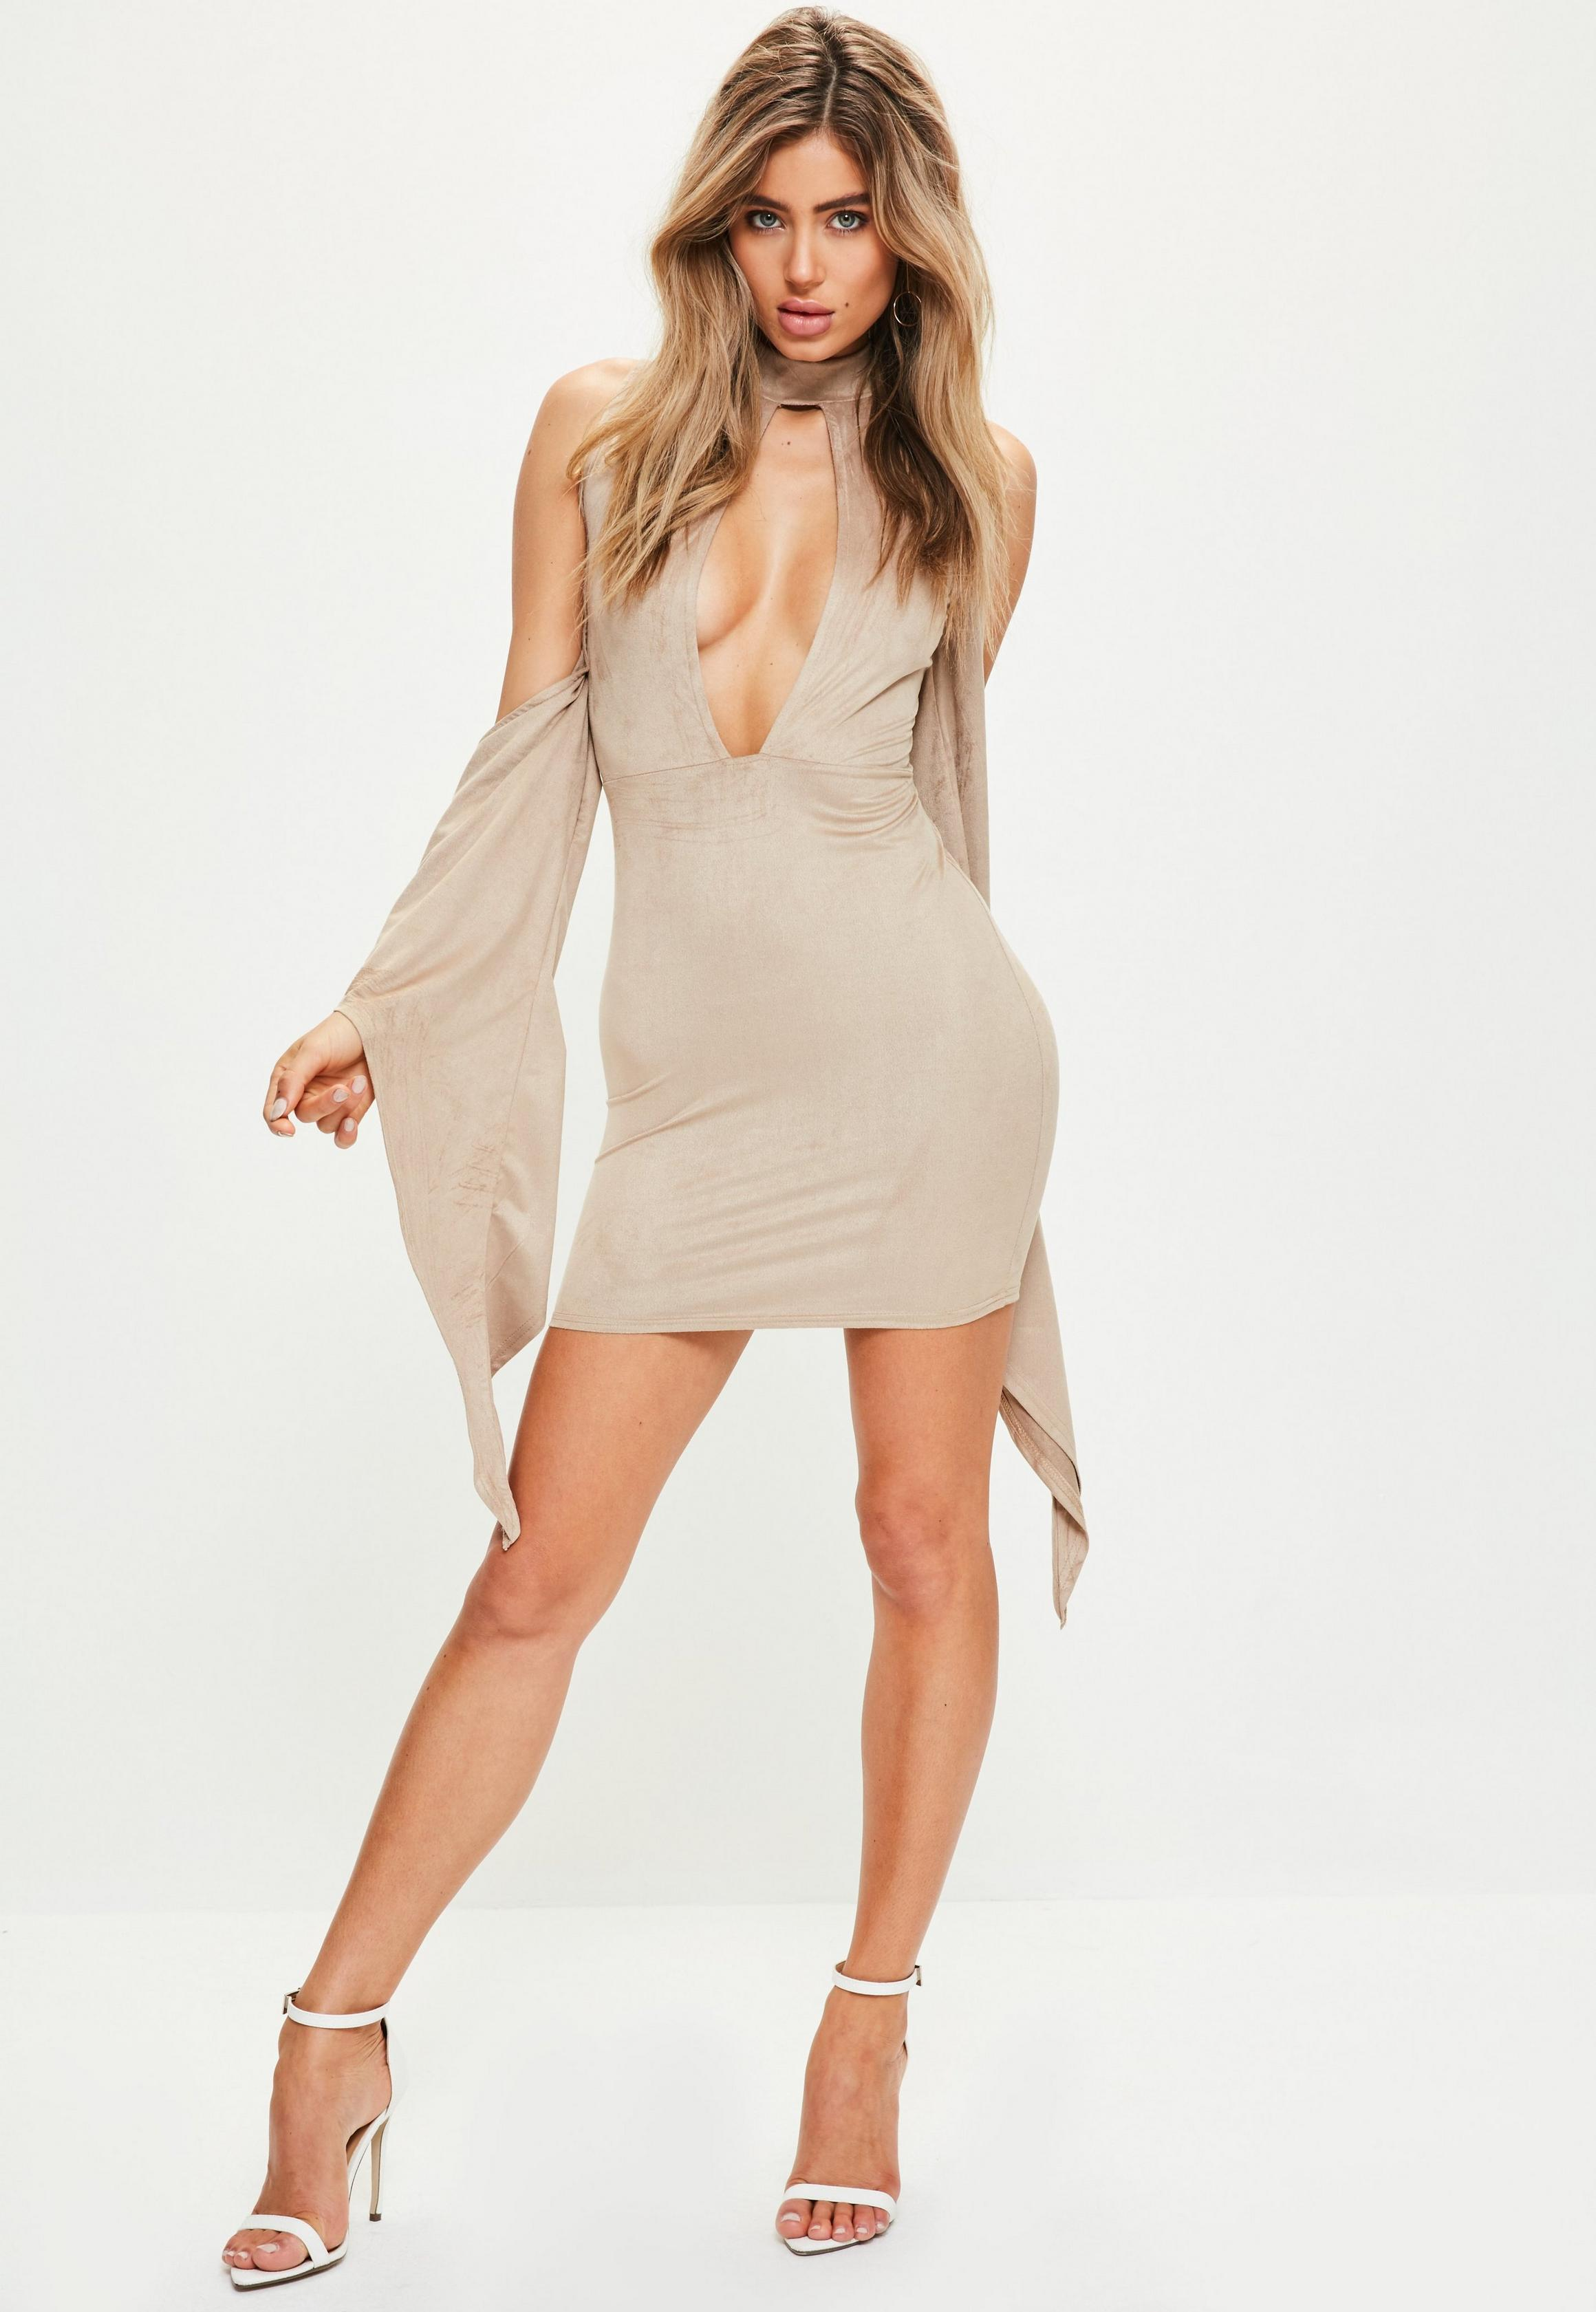 Khaki Square Neck Bodycon Dress | Missguided Australia